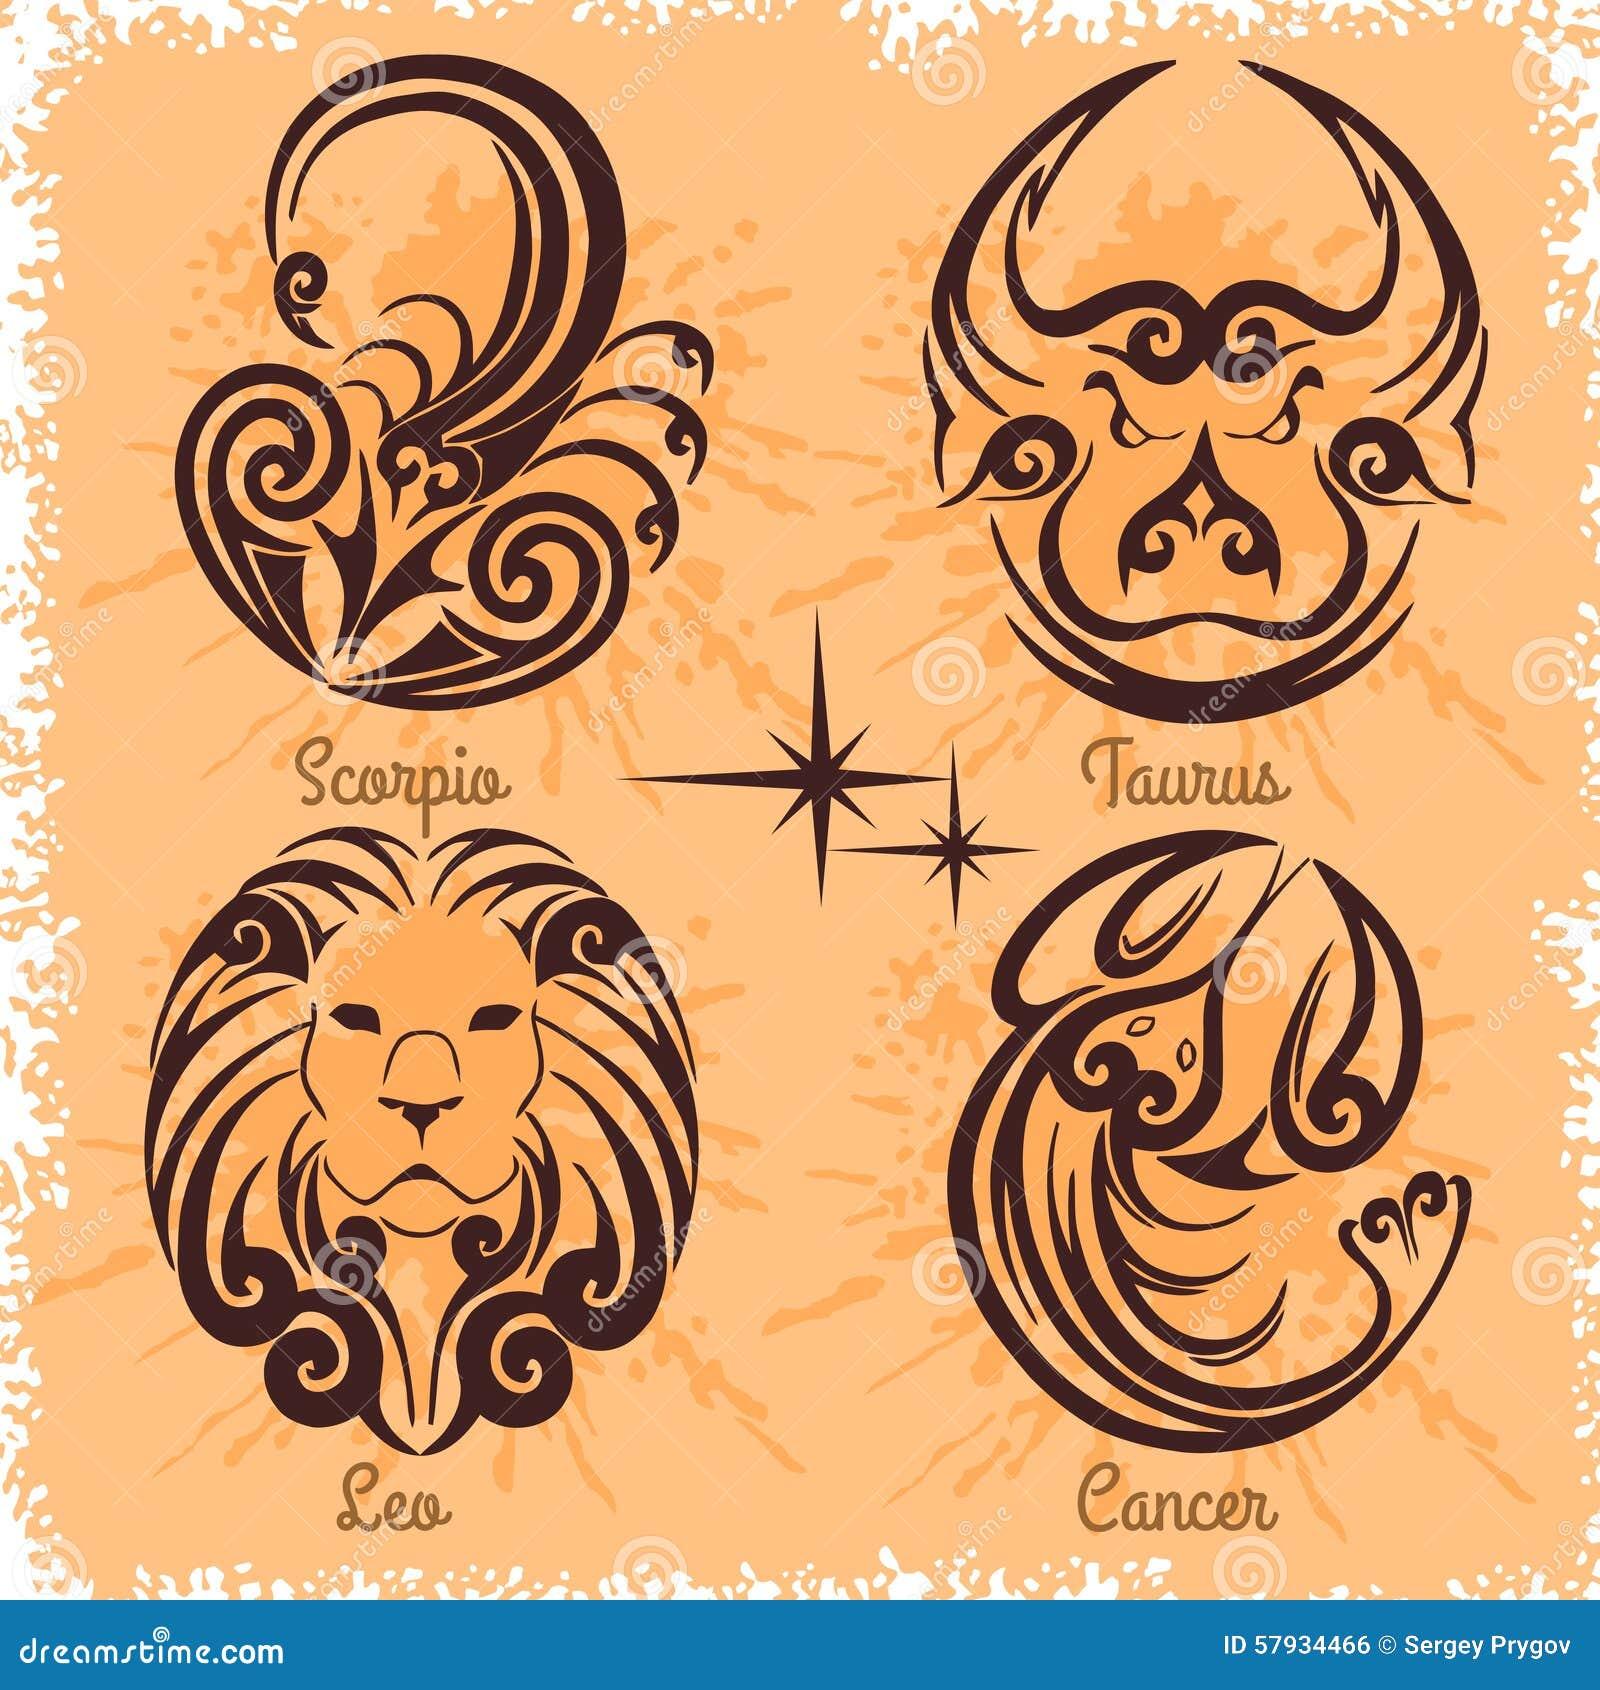 zodiac signs cancer leo taurus scorpio stock vector. Black Bedroom Furniture Sets. Home Design Ideas